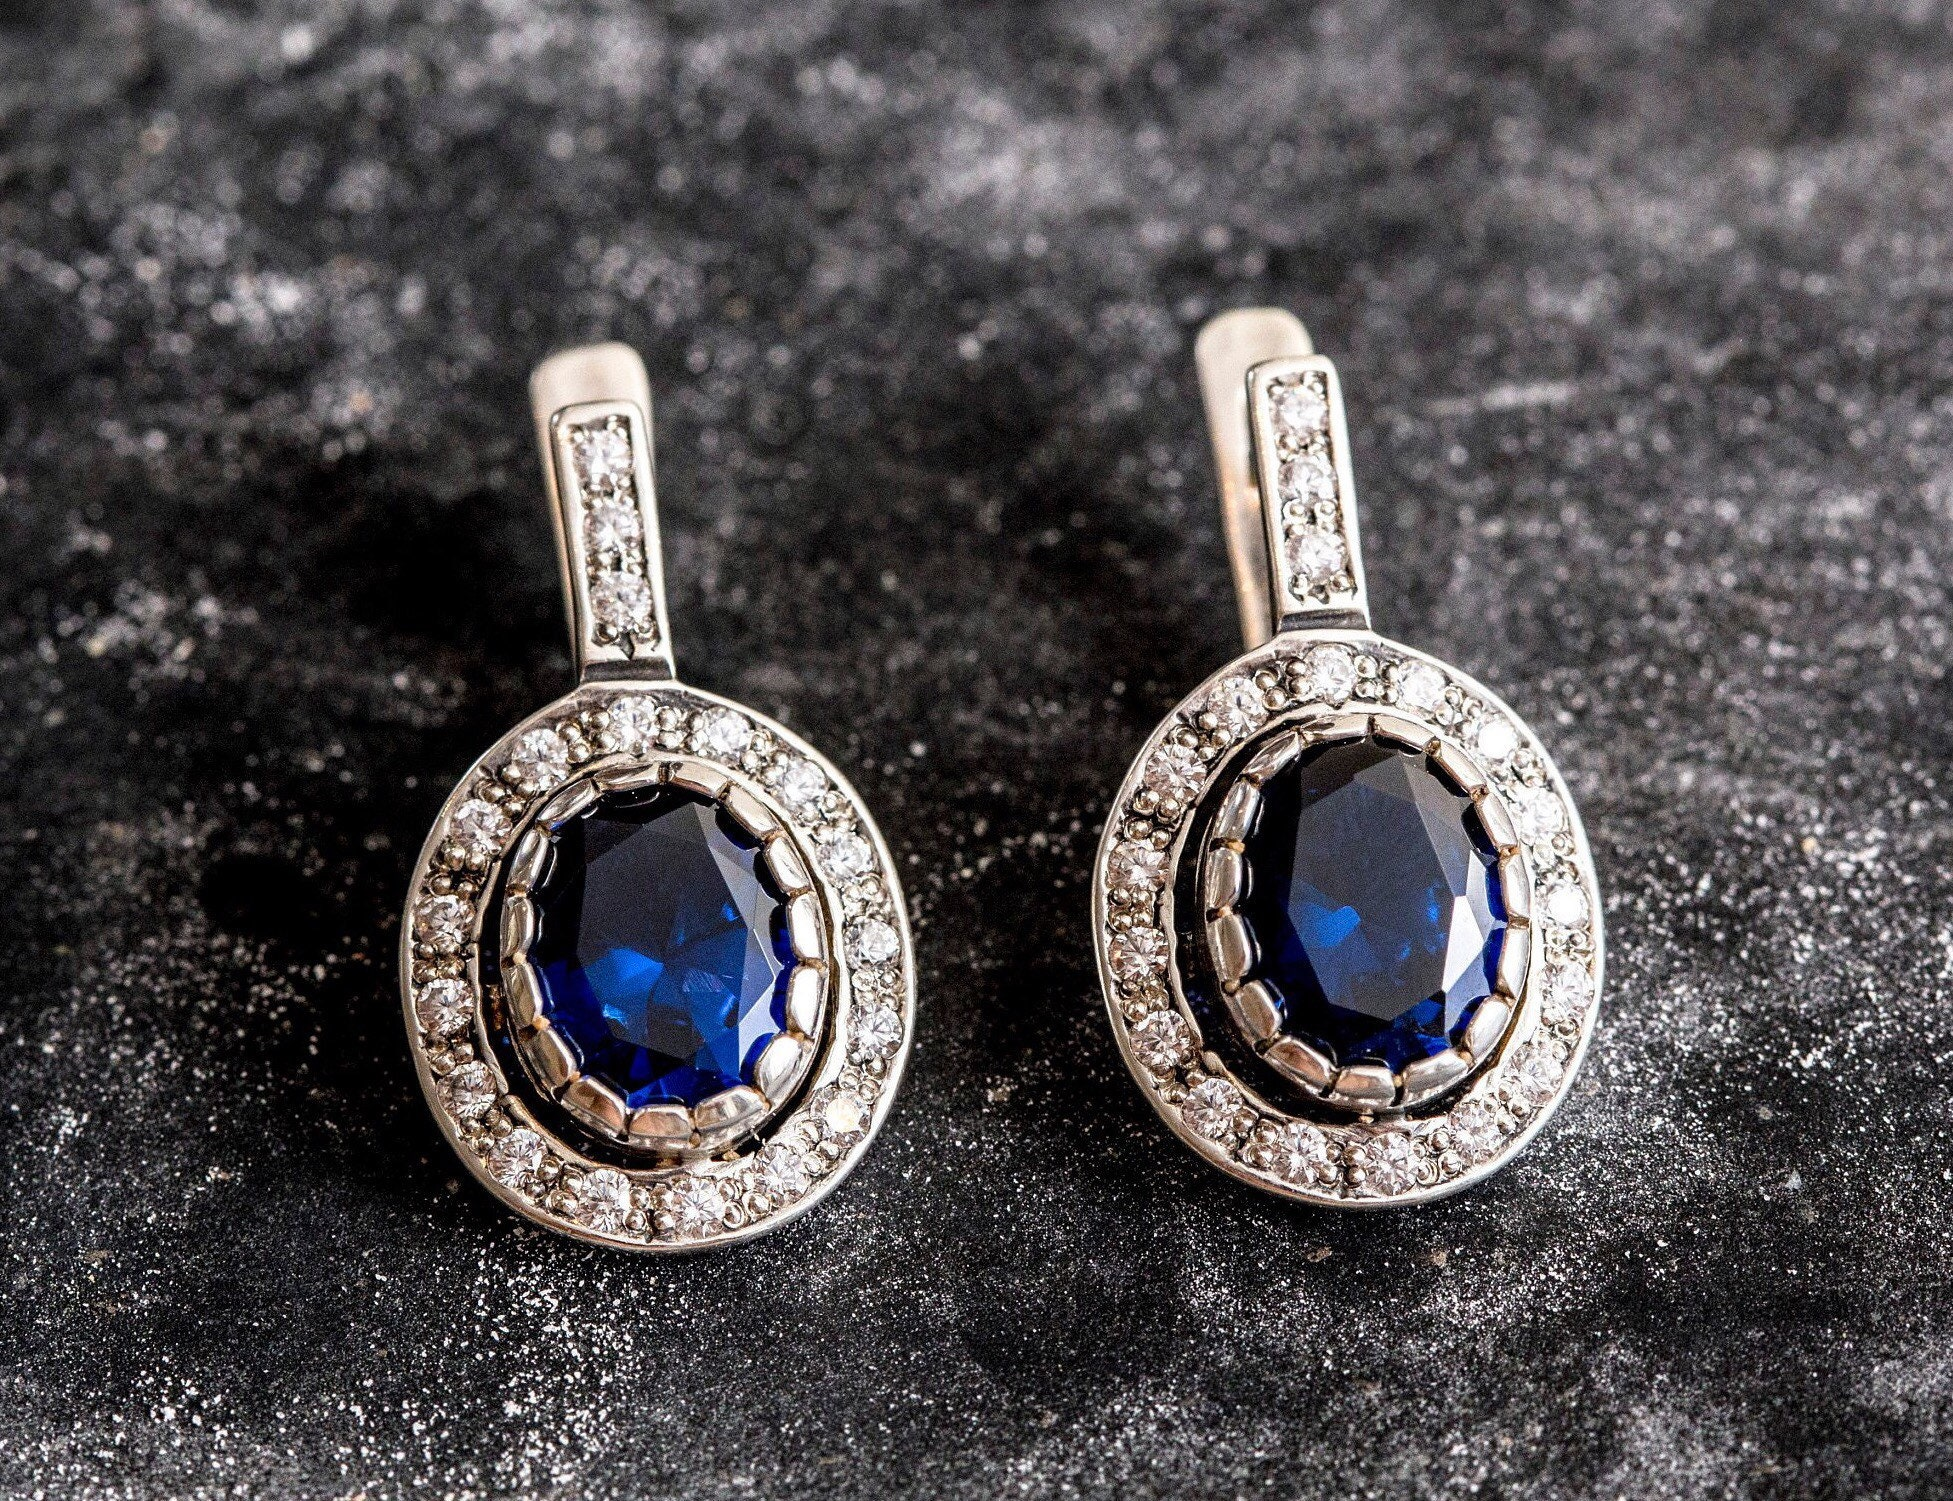 Sapphire Earrings Antique Earrings Vintage Earrings Antique